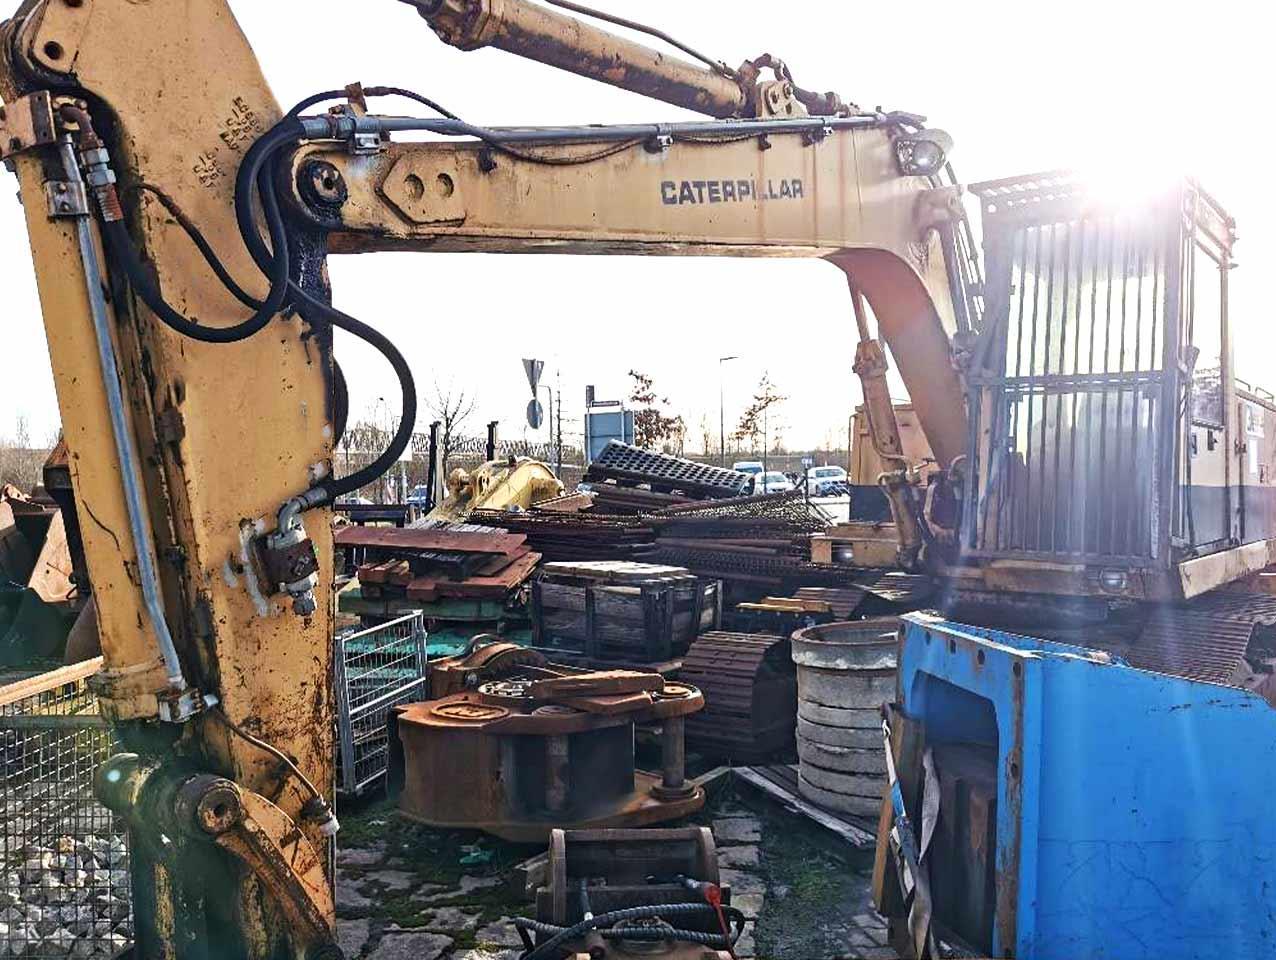 Caterpillar 215C Excavator with new drive